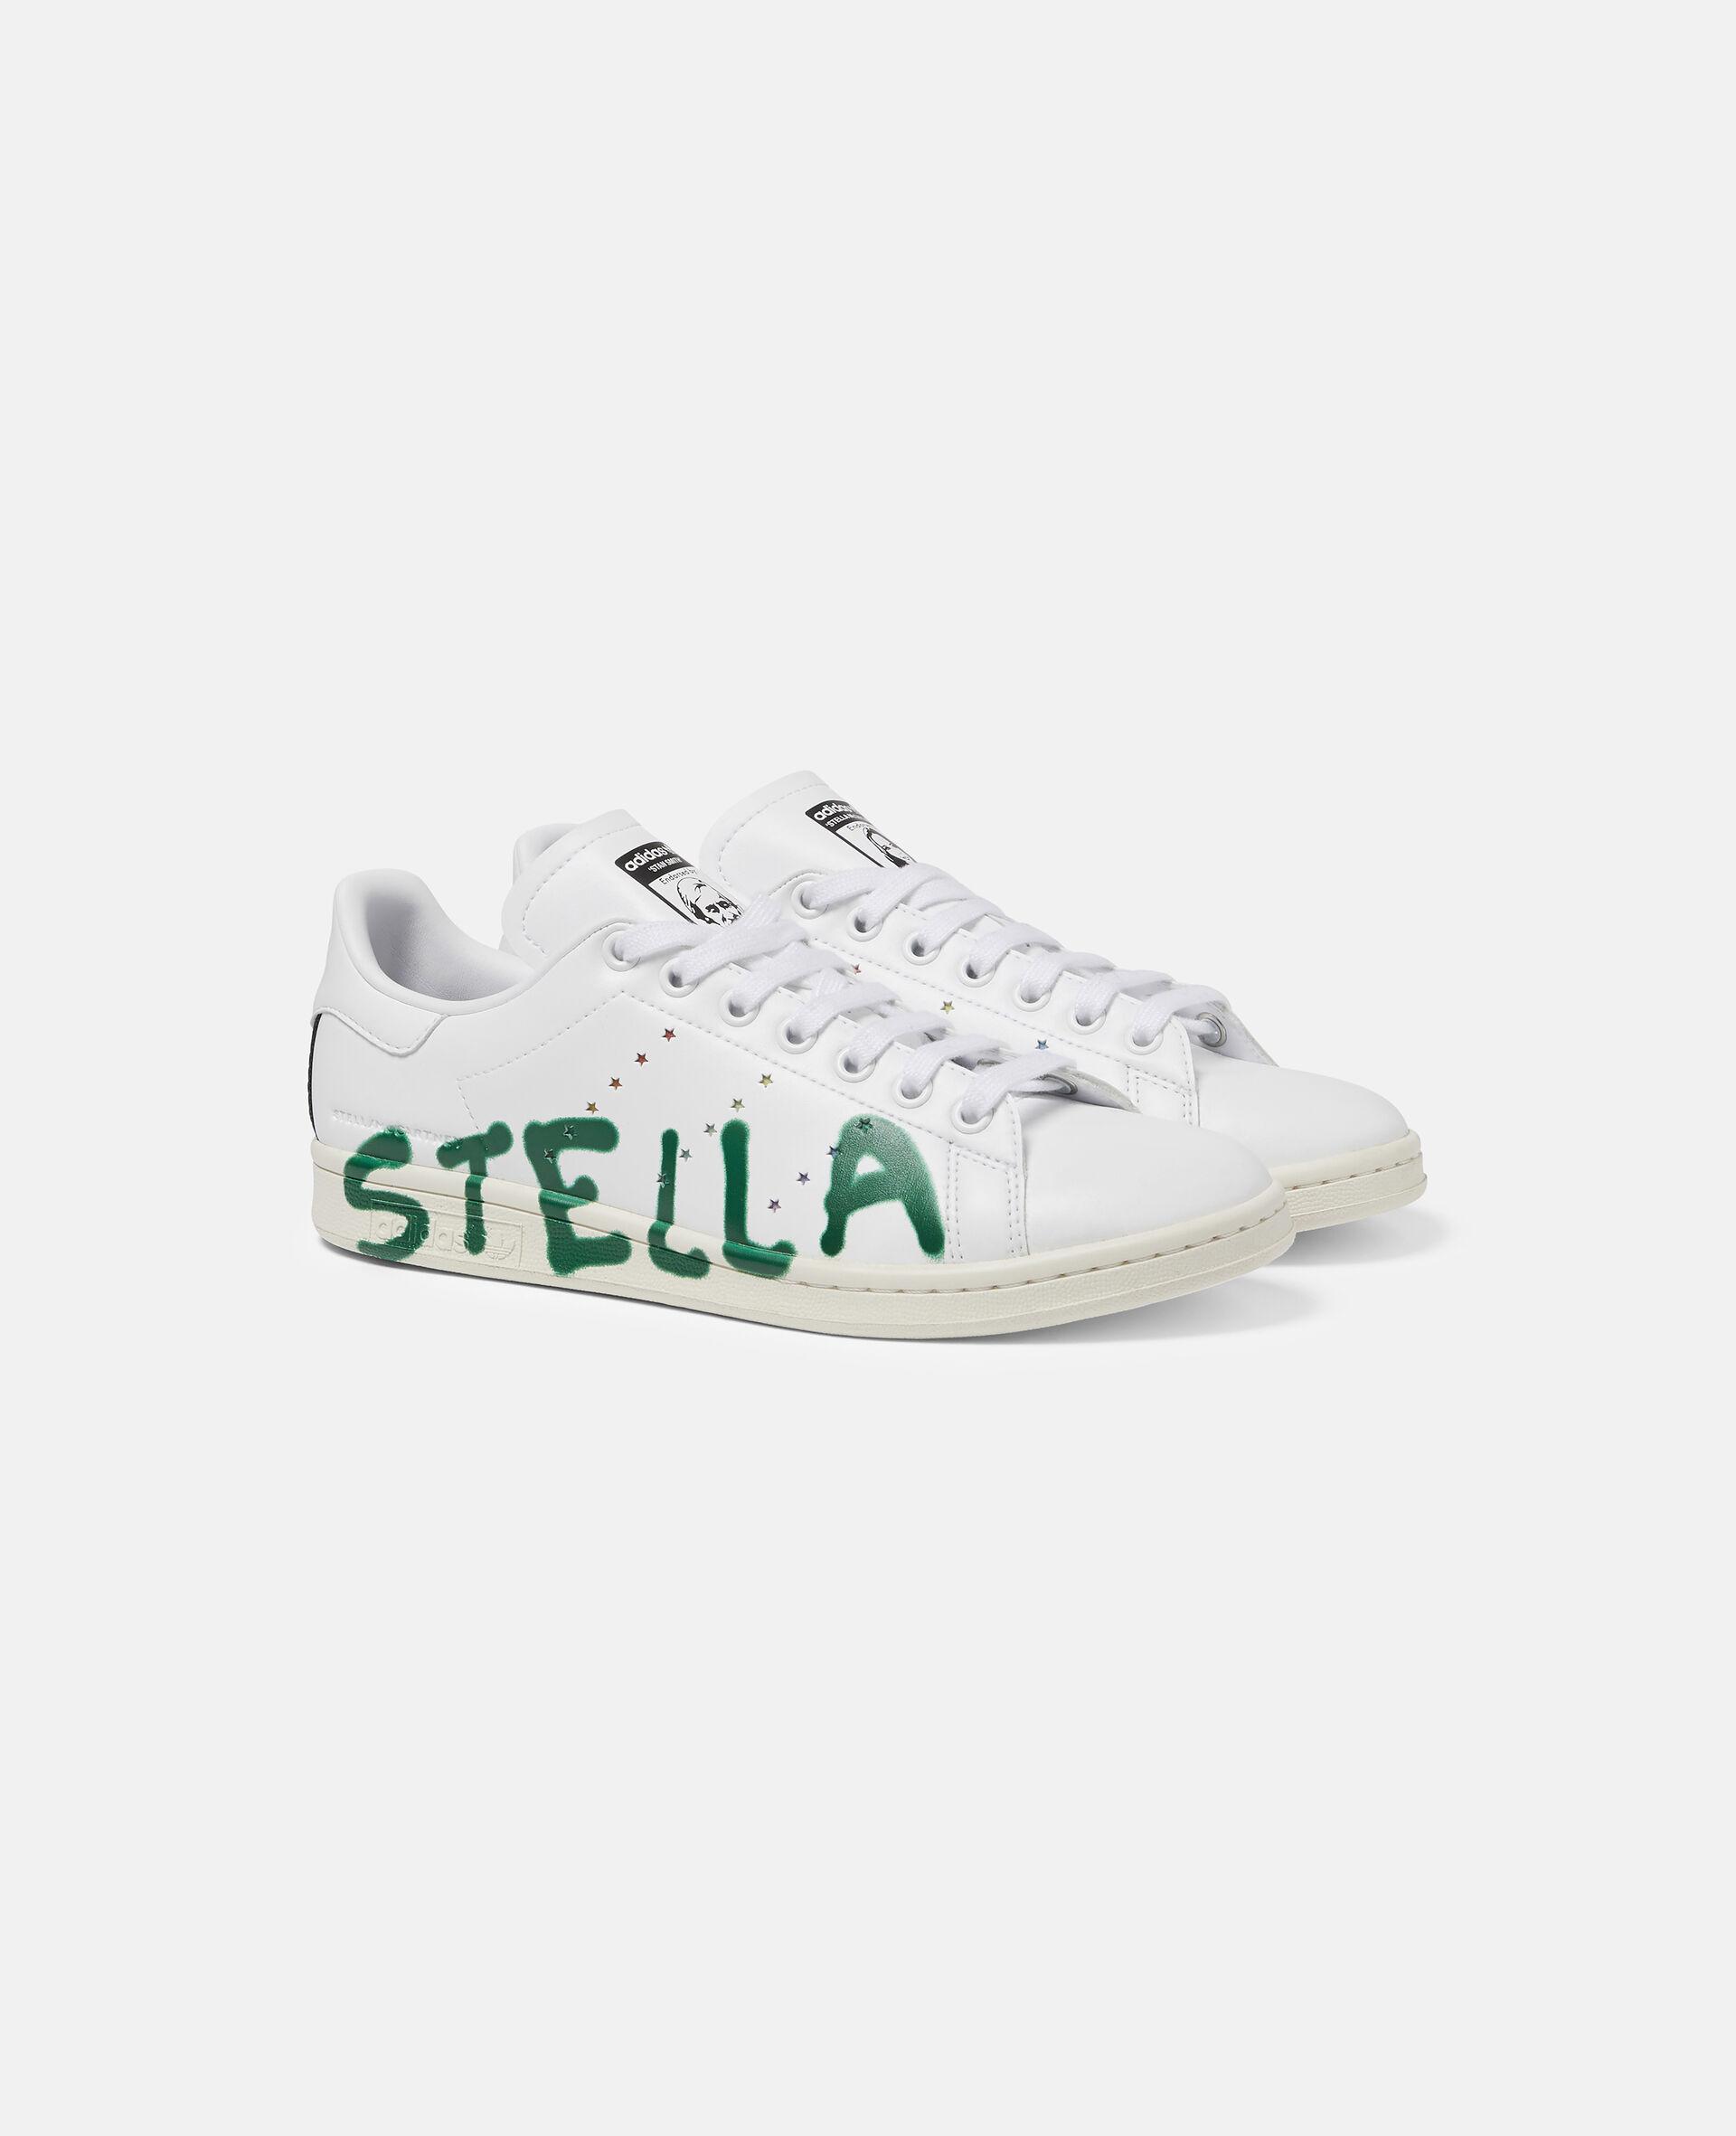 Ed Curtis Stella StanSmith adidas-Weiß-large image number 2